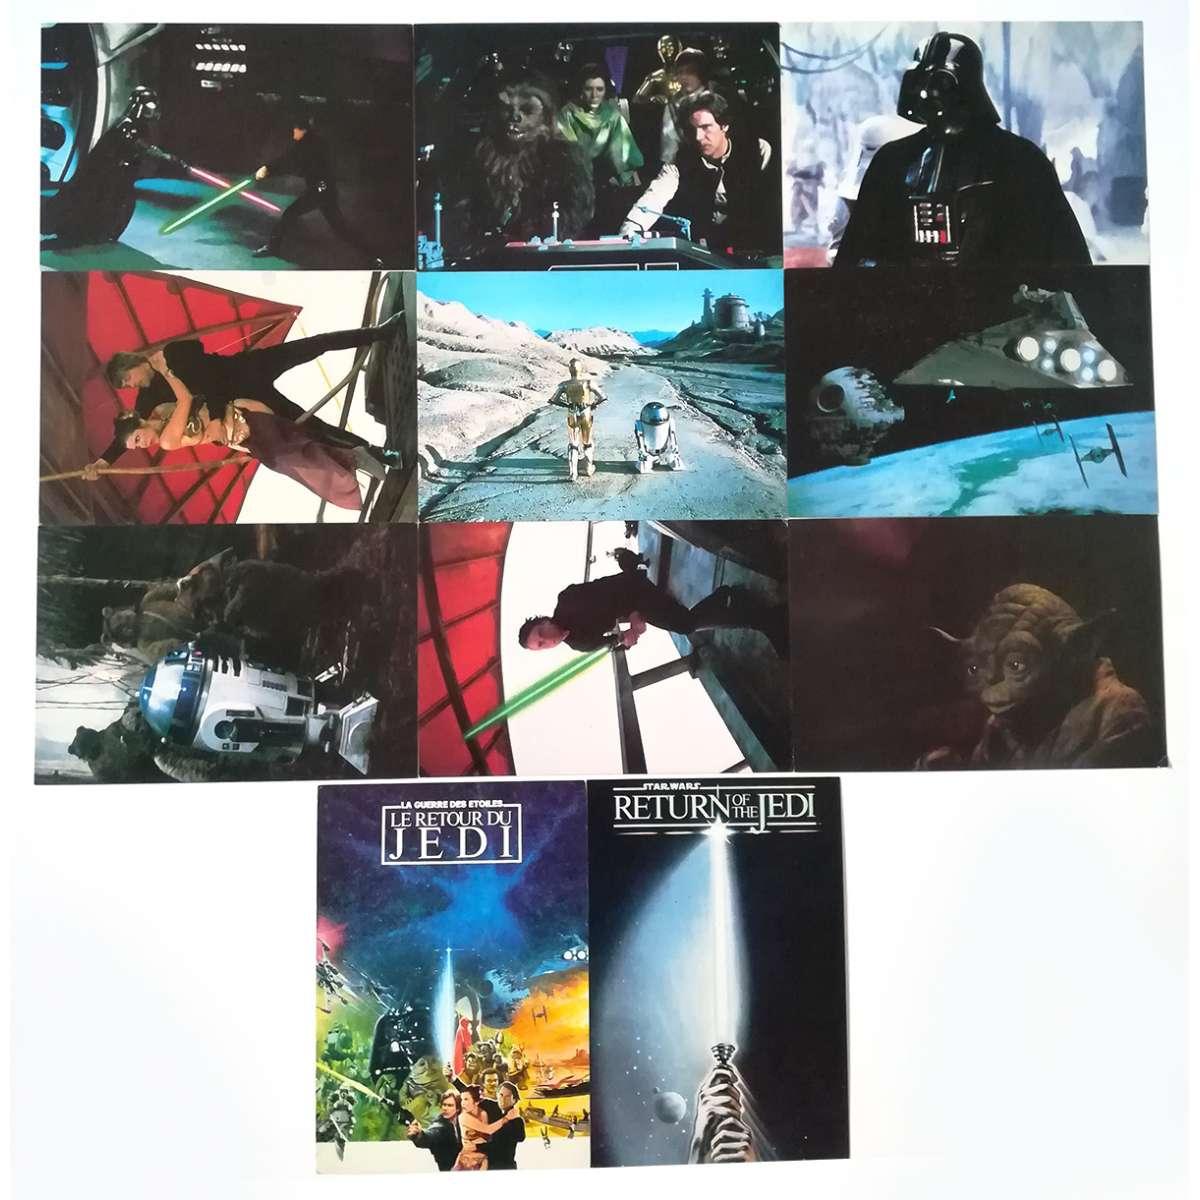 Star Wars The Return Of The Jedi Postcards Lot 3 5x5 5 In